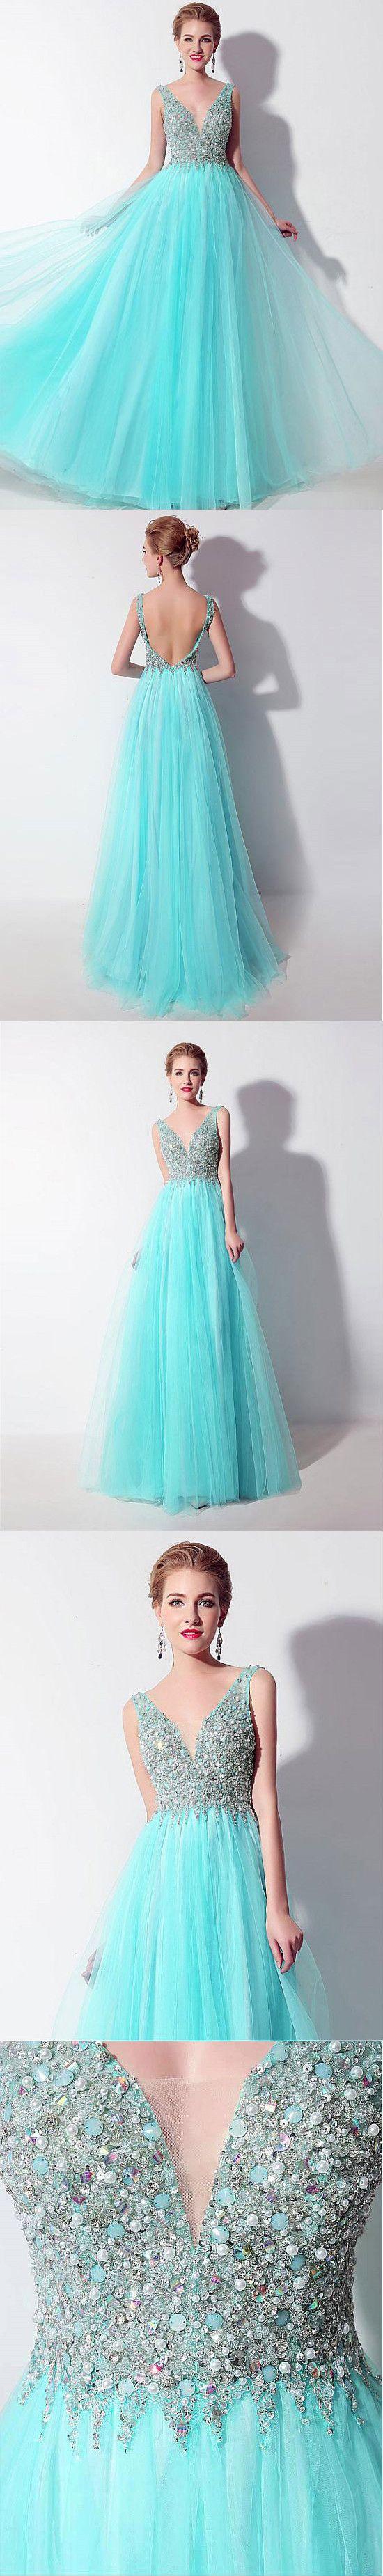 Aline vneck floorlength tulle beaded sequined prom dress